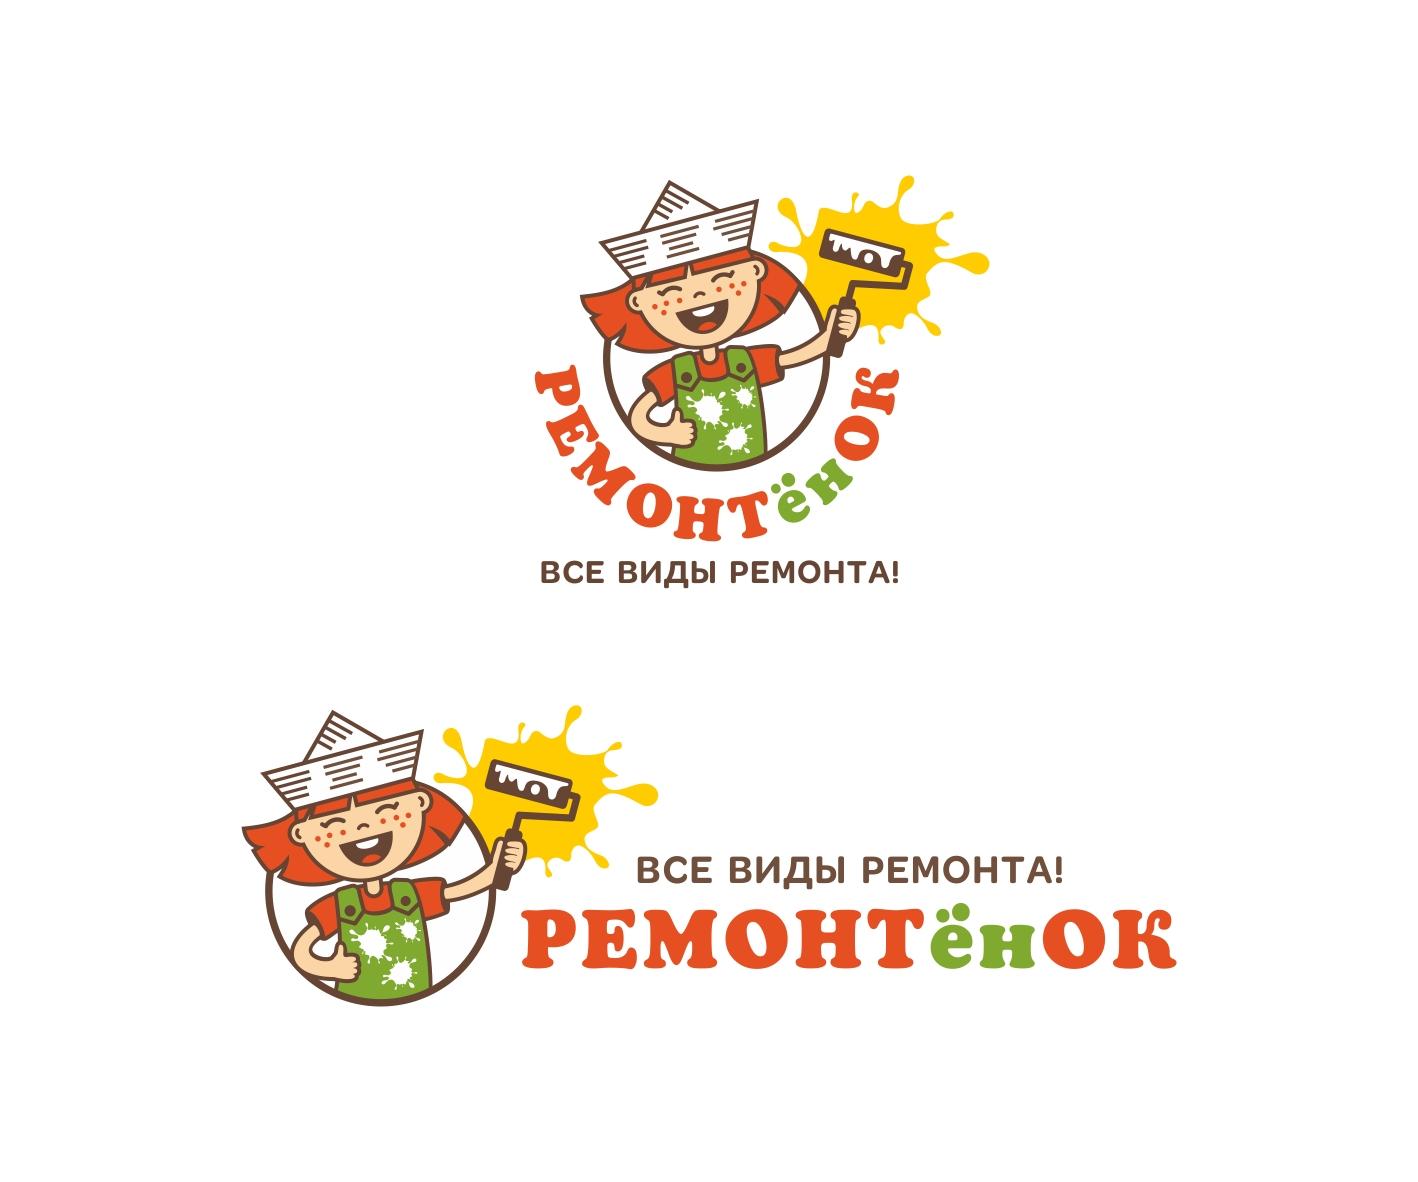 Ремонтёнок: логотип + брэндбук + фирменный стиль фото f_9845957c54243b57.jpg